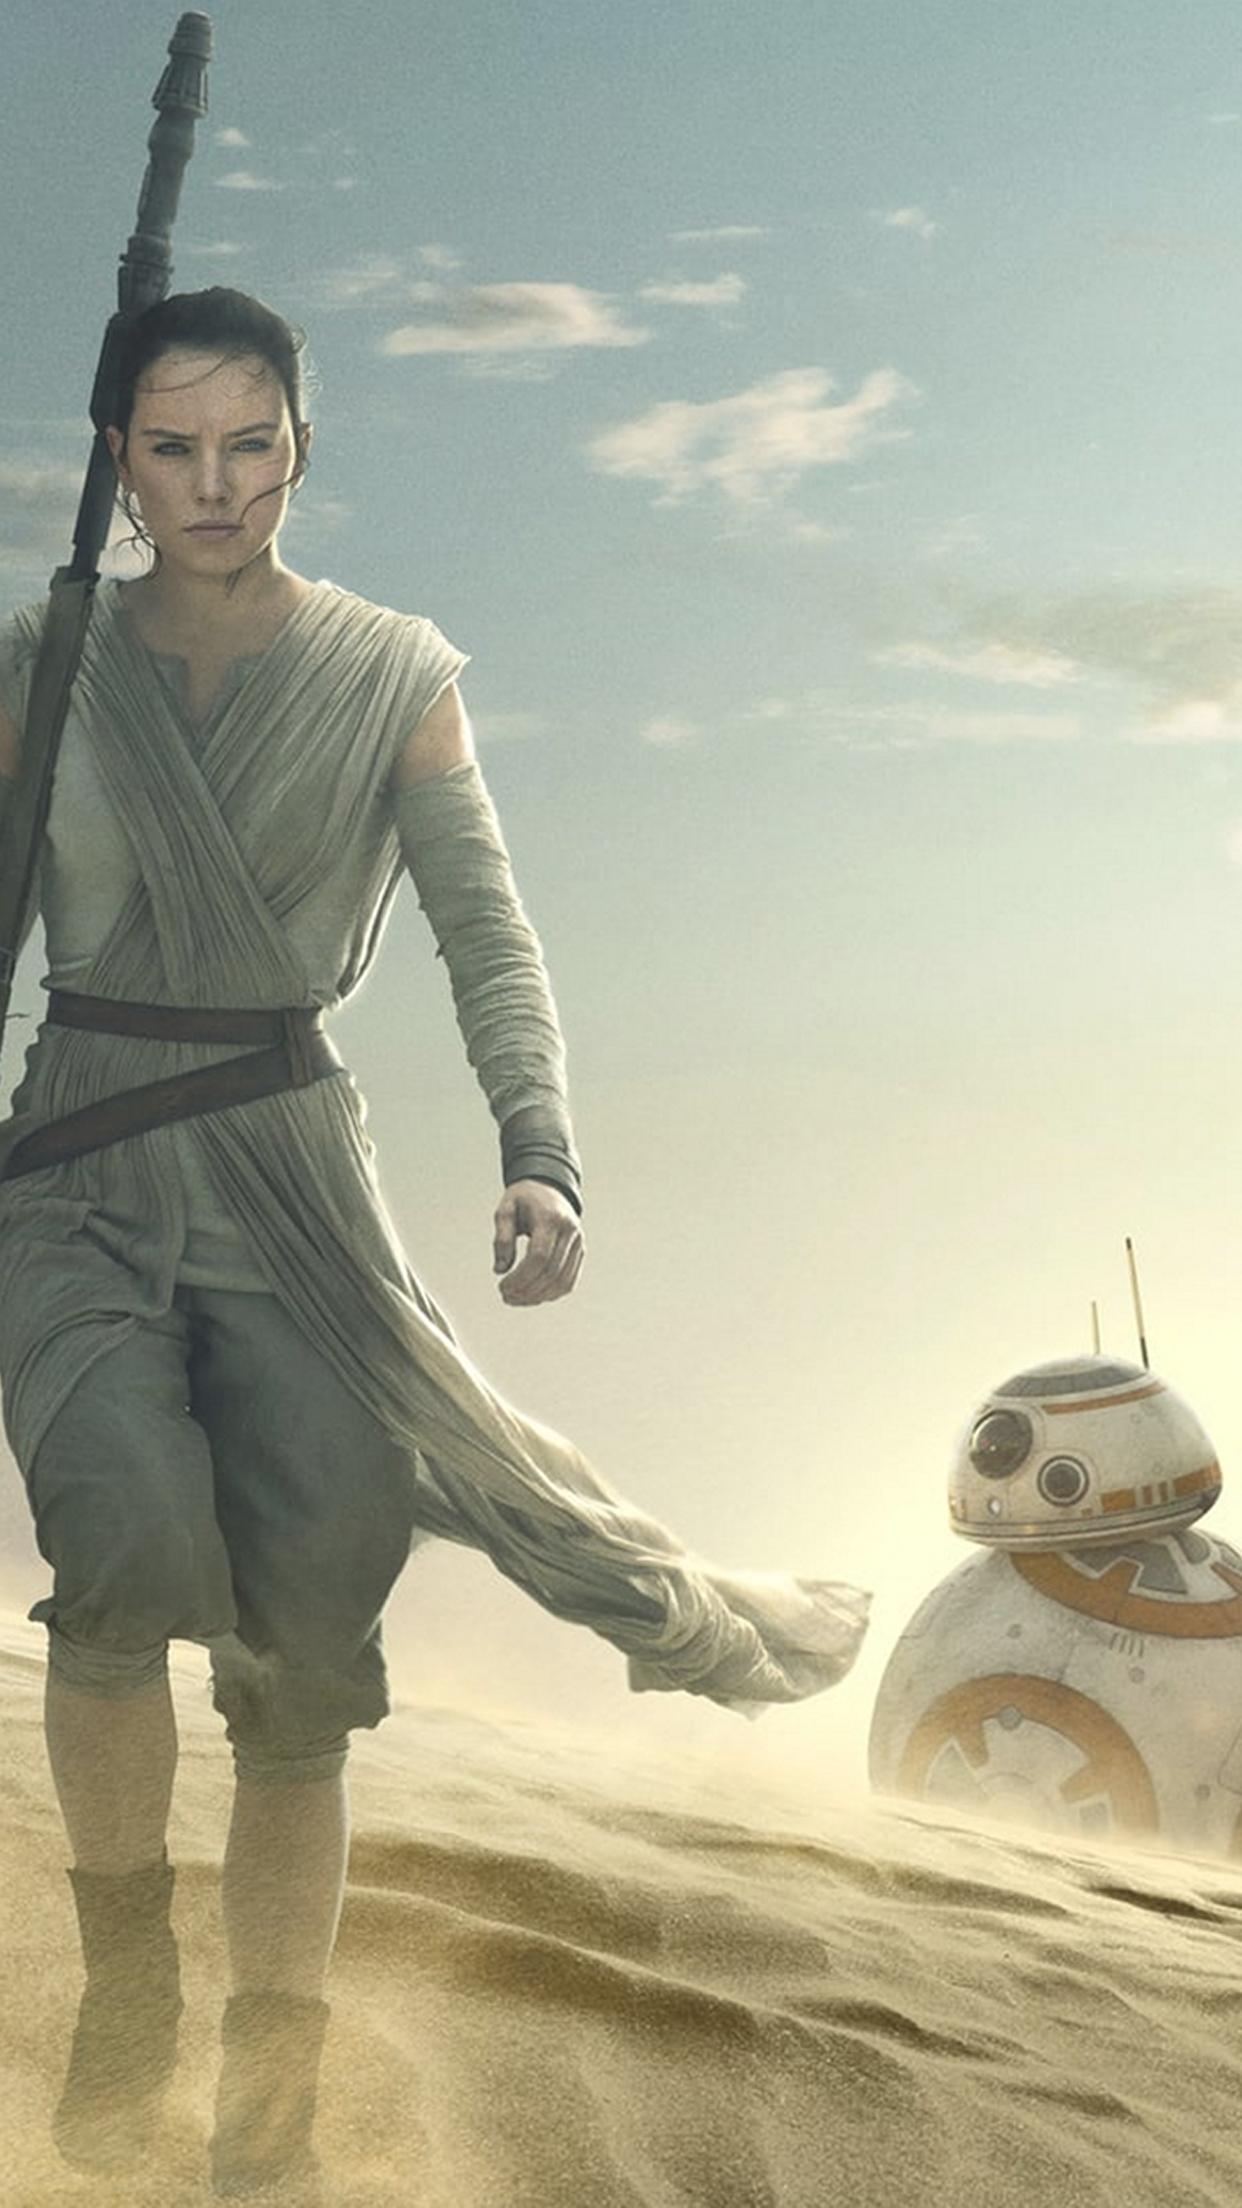 force-awakens-wallpaper (10)